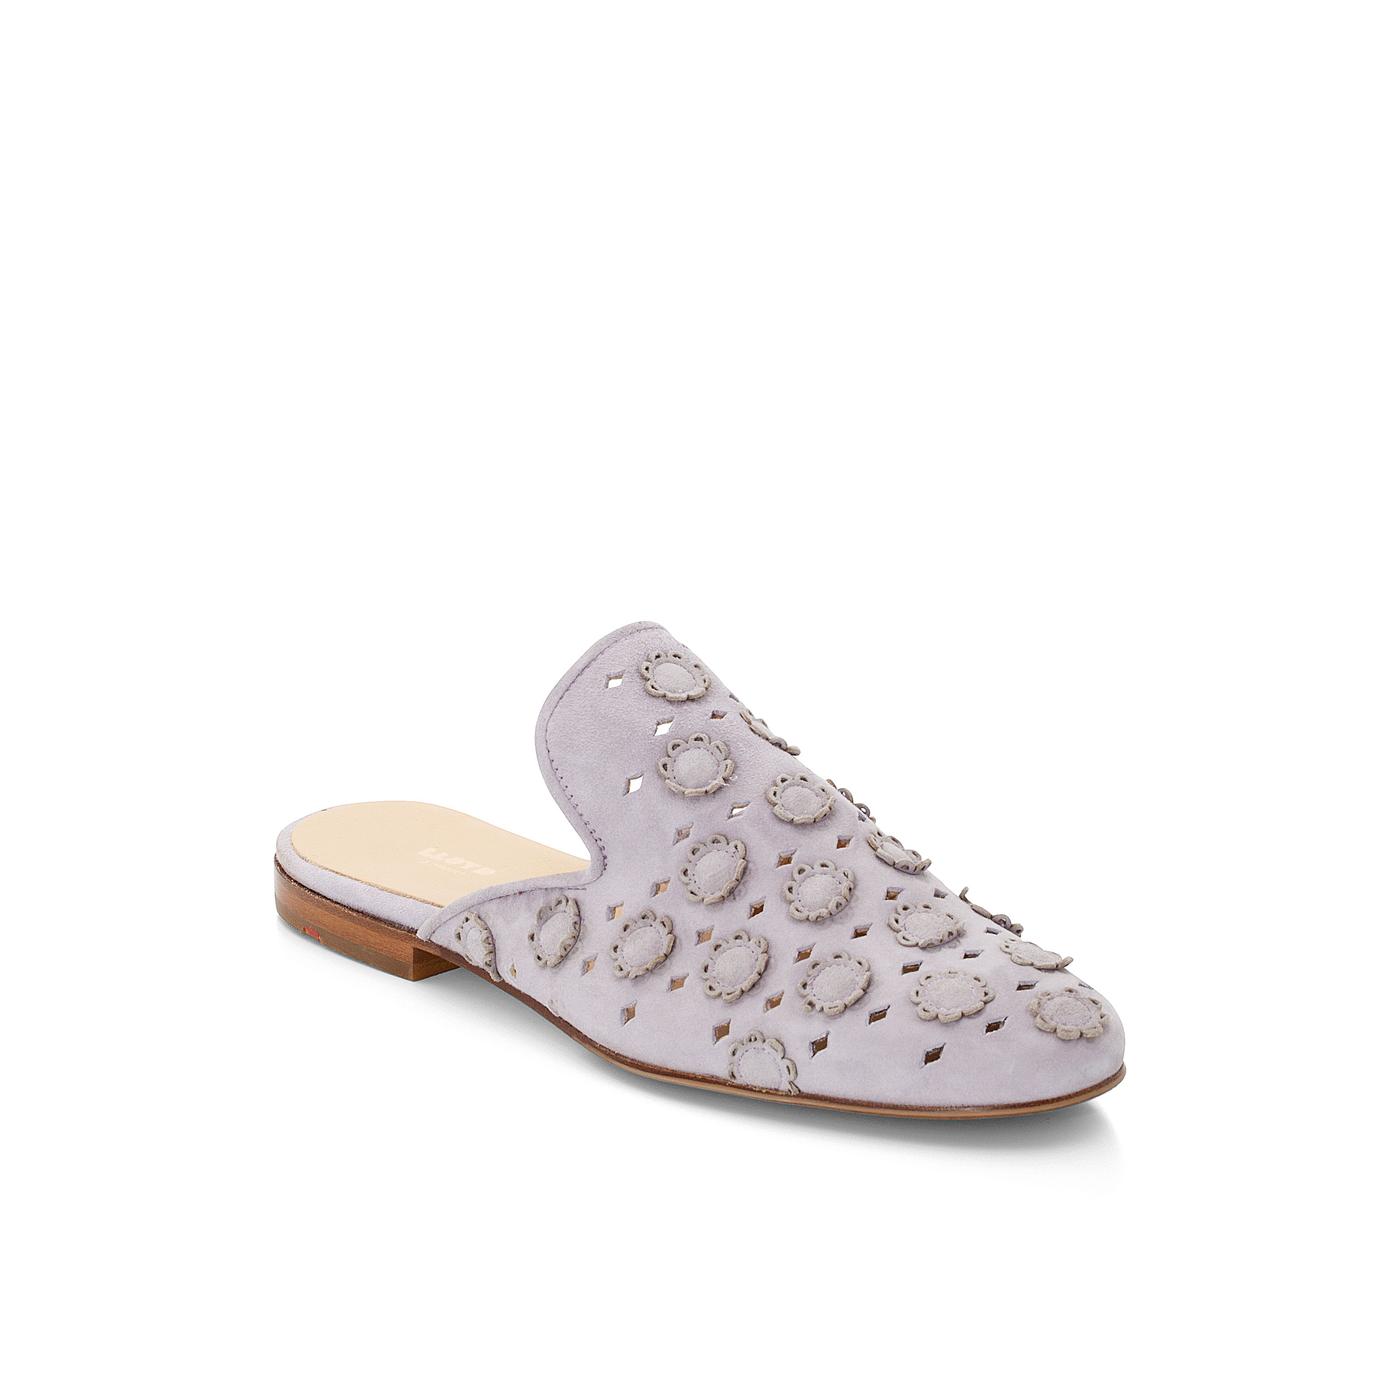 PANTOLETTEN | Schuhe > Clogs & Pantoletten | Lila | Rauleder -  leder | LLOYD